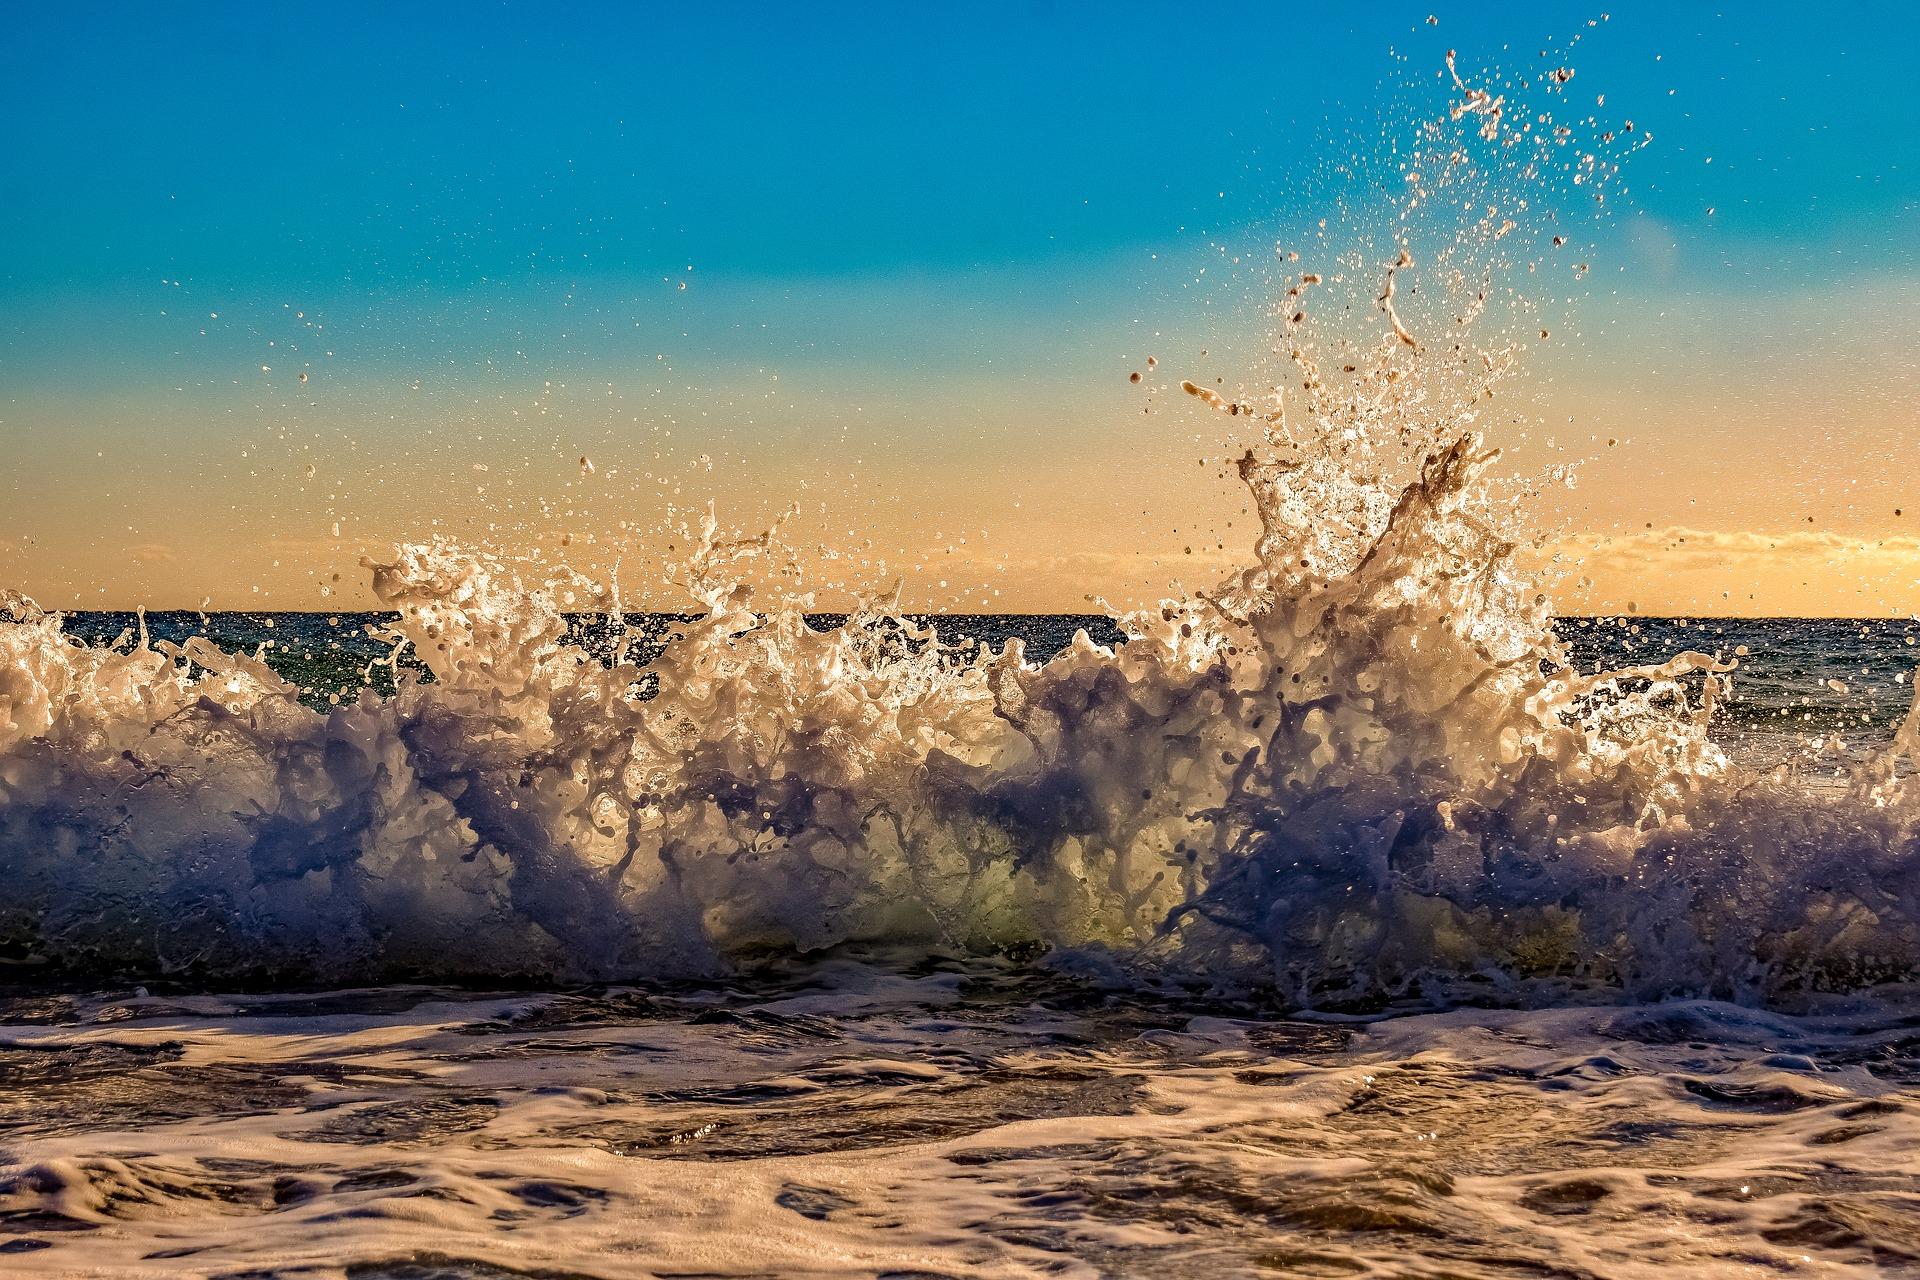 wave-3805146_1920.jpg